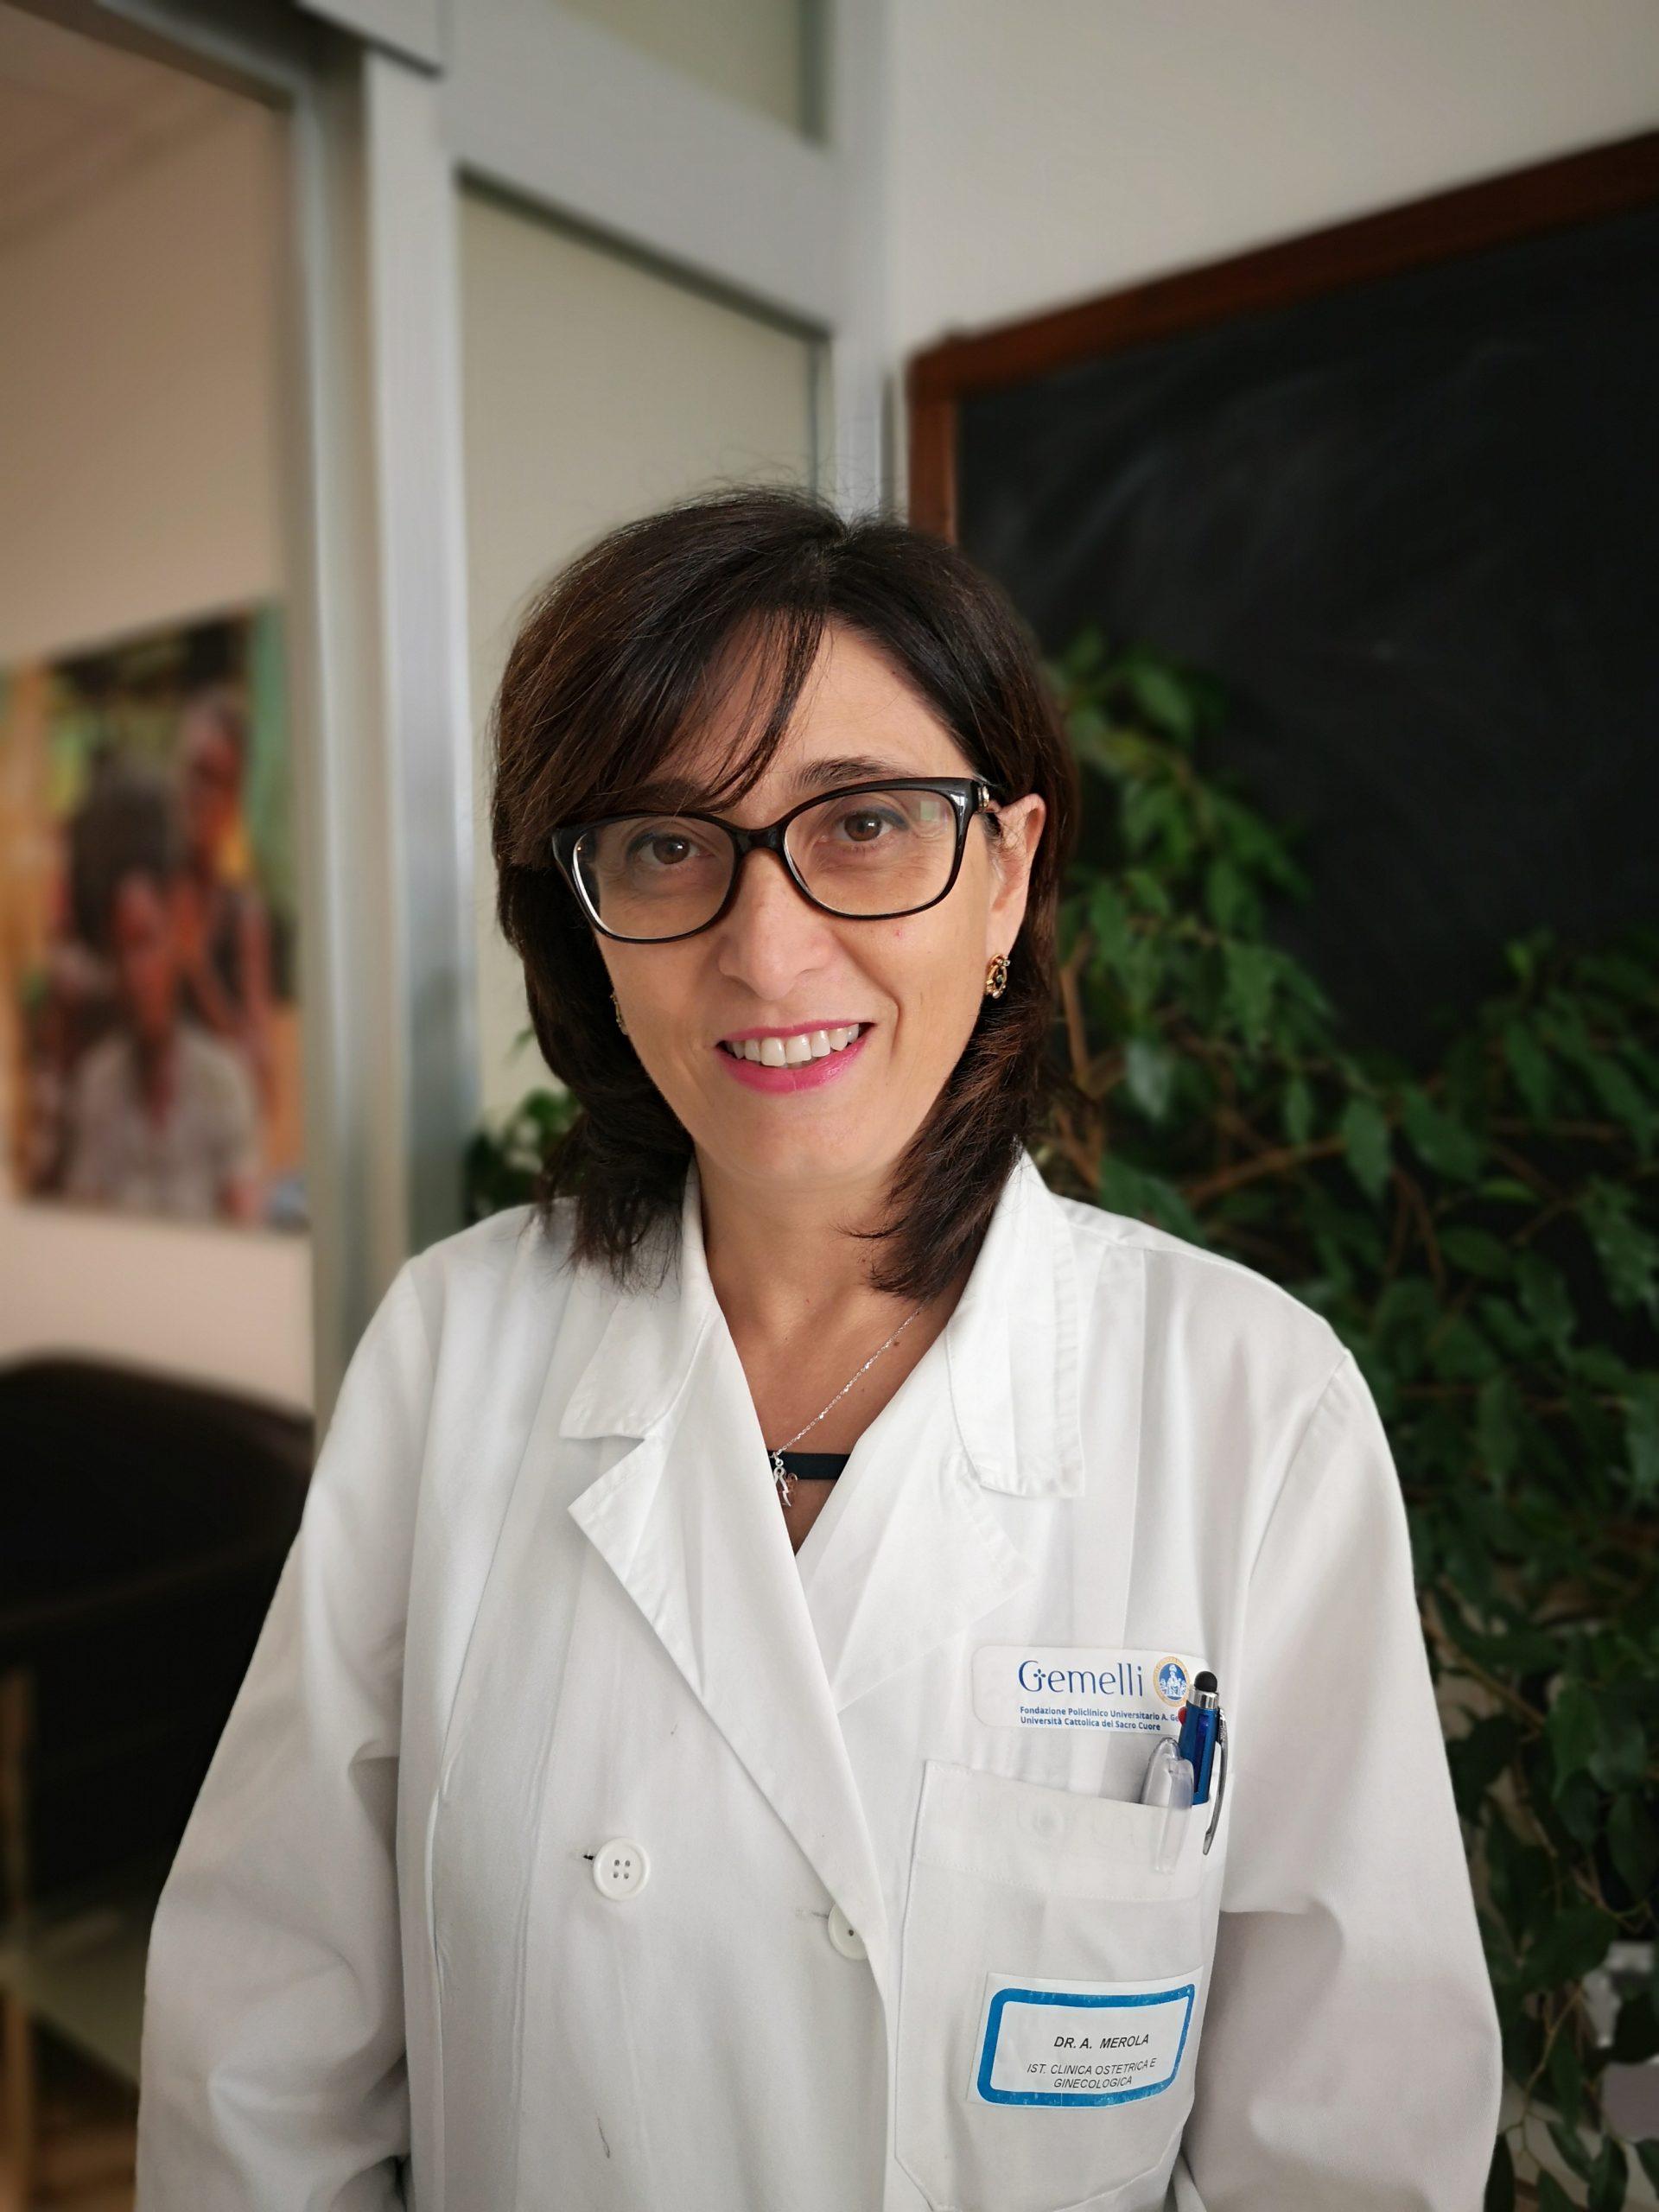 Dott.ssa ANNAMARIA MEROLA